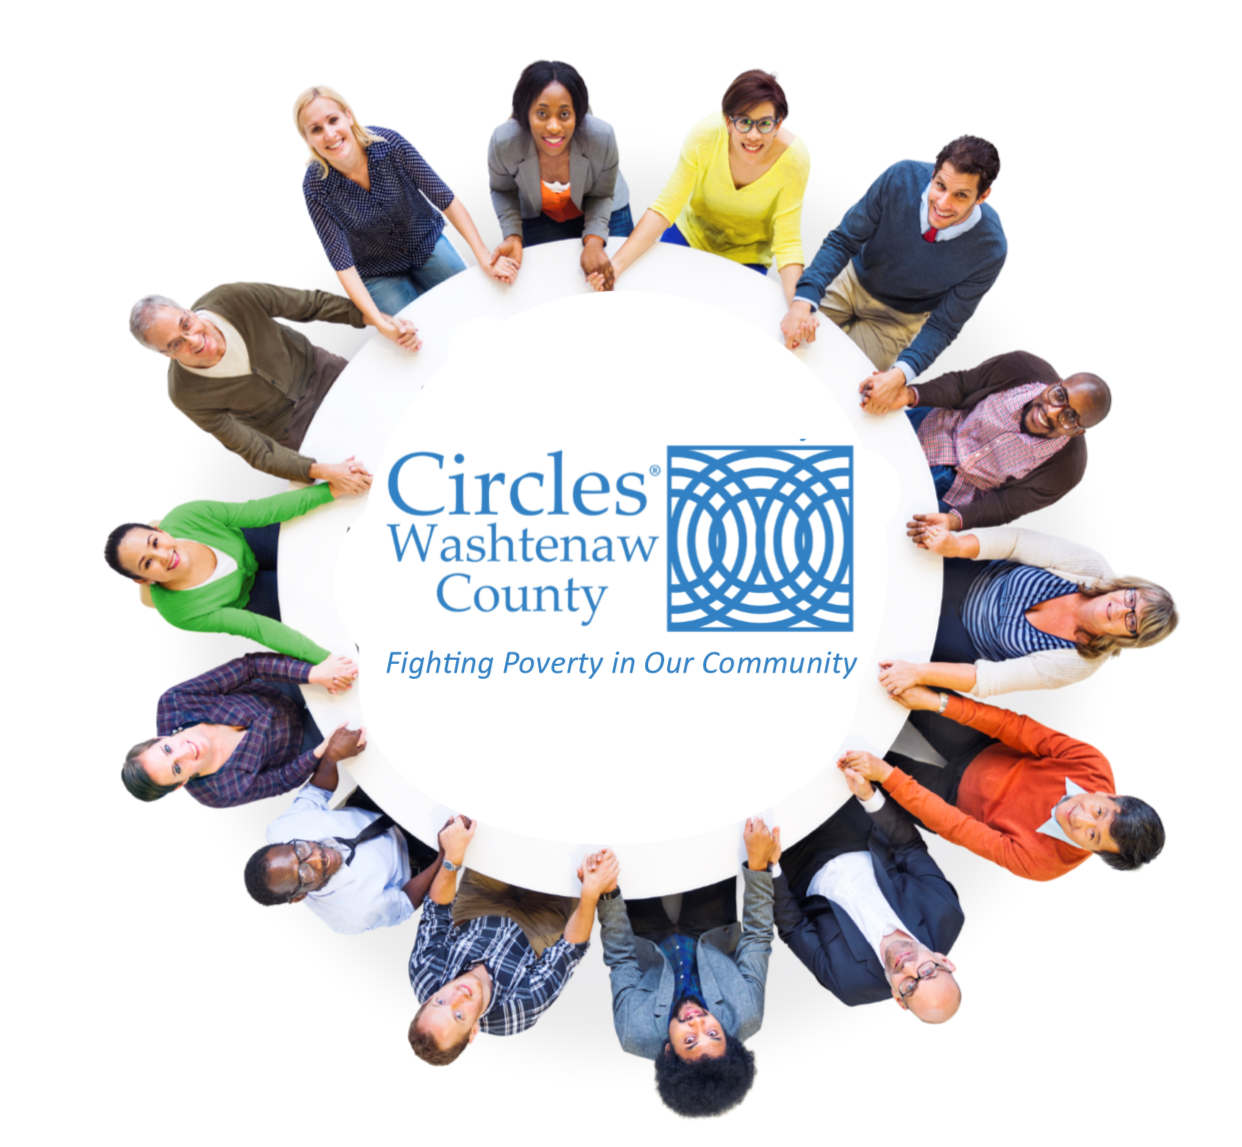 Circles of Washtenaw County